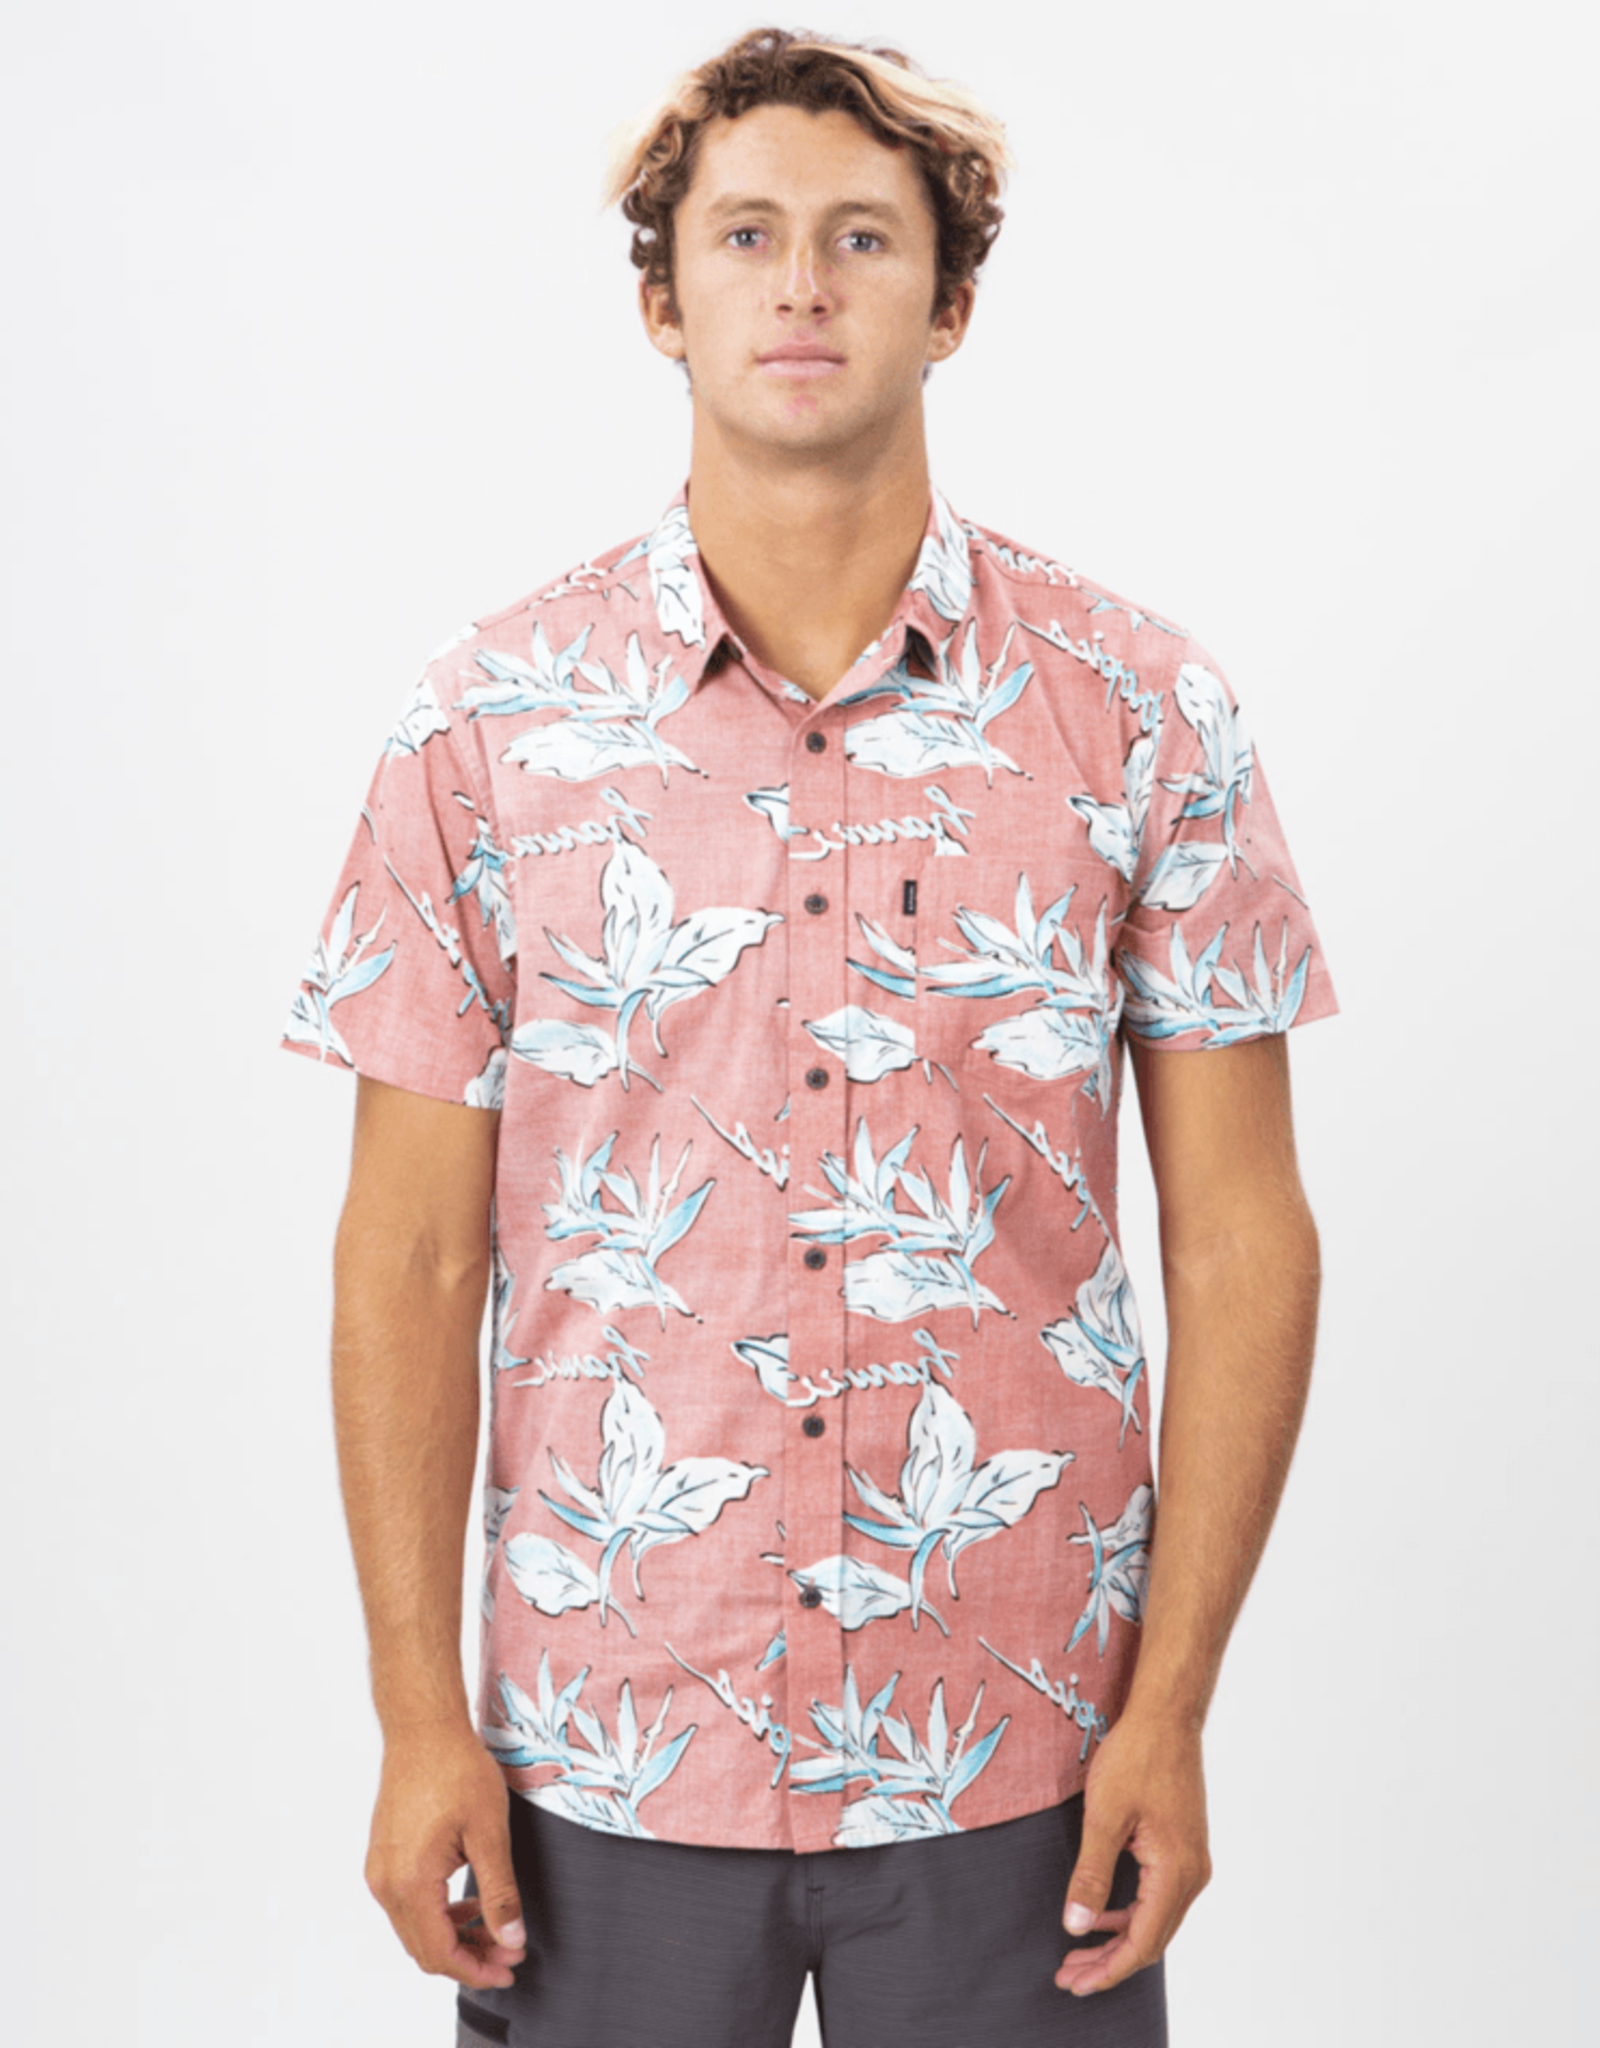 RIPCURL HAWAII FLORAL S/S SHIRT